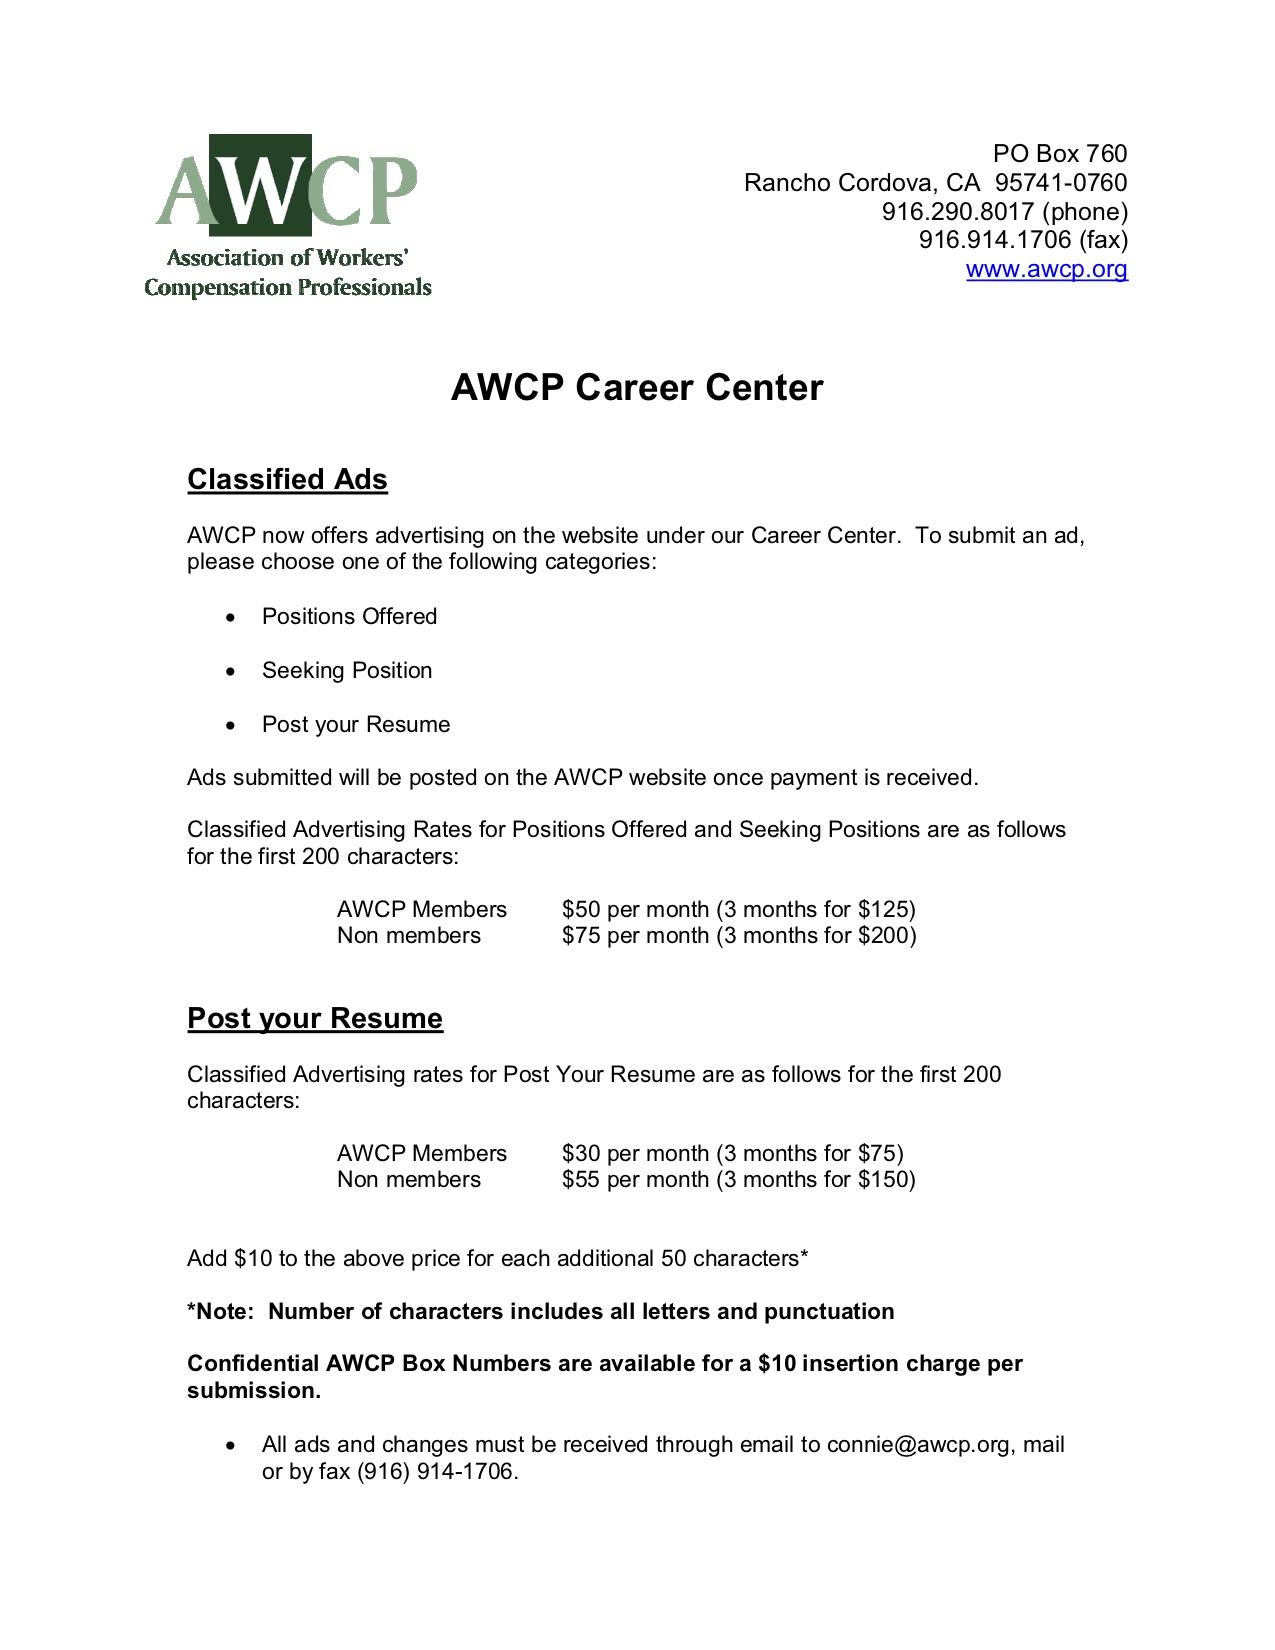 AWCP Career Center Criteria 1